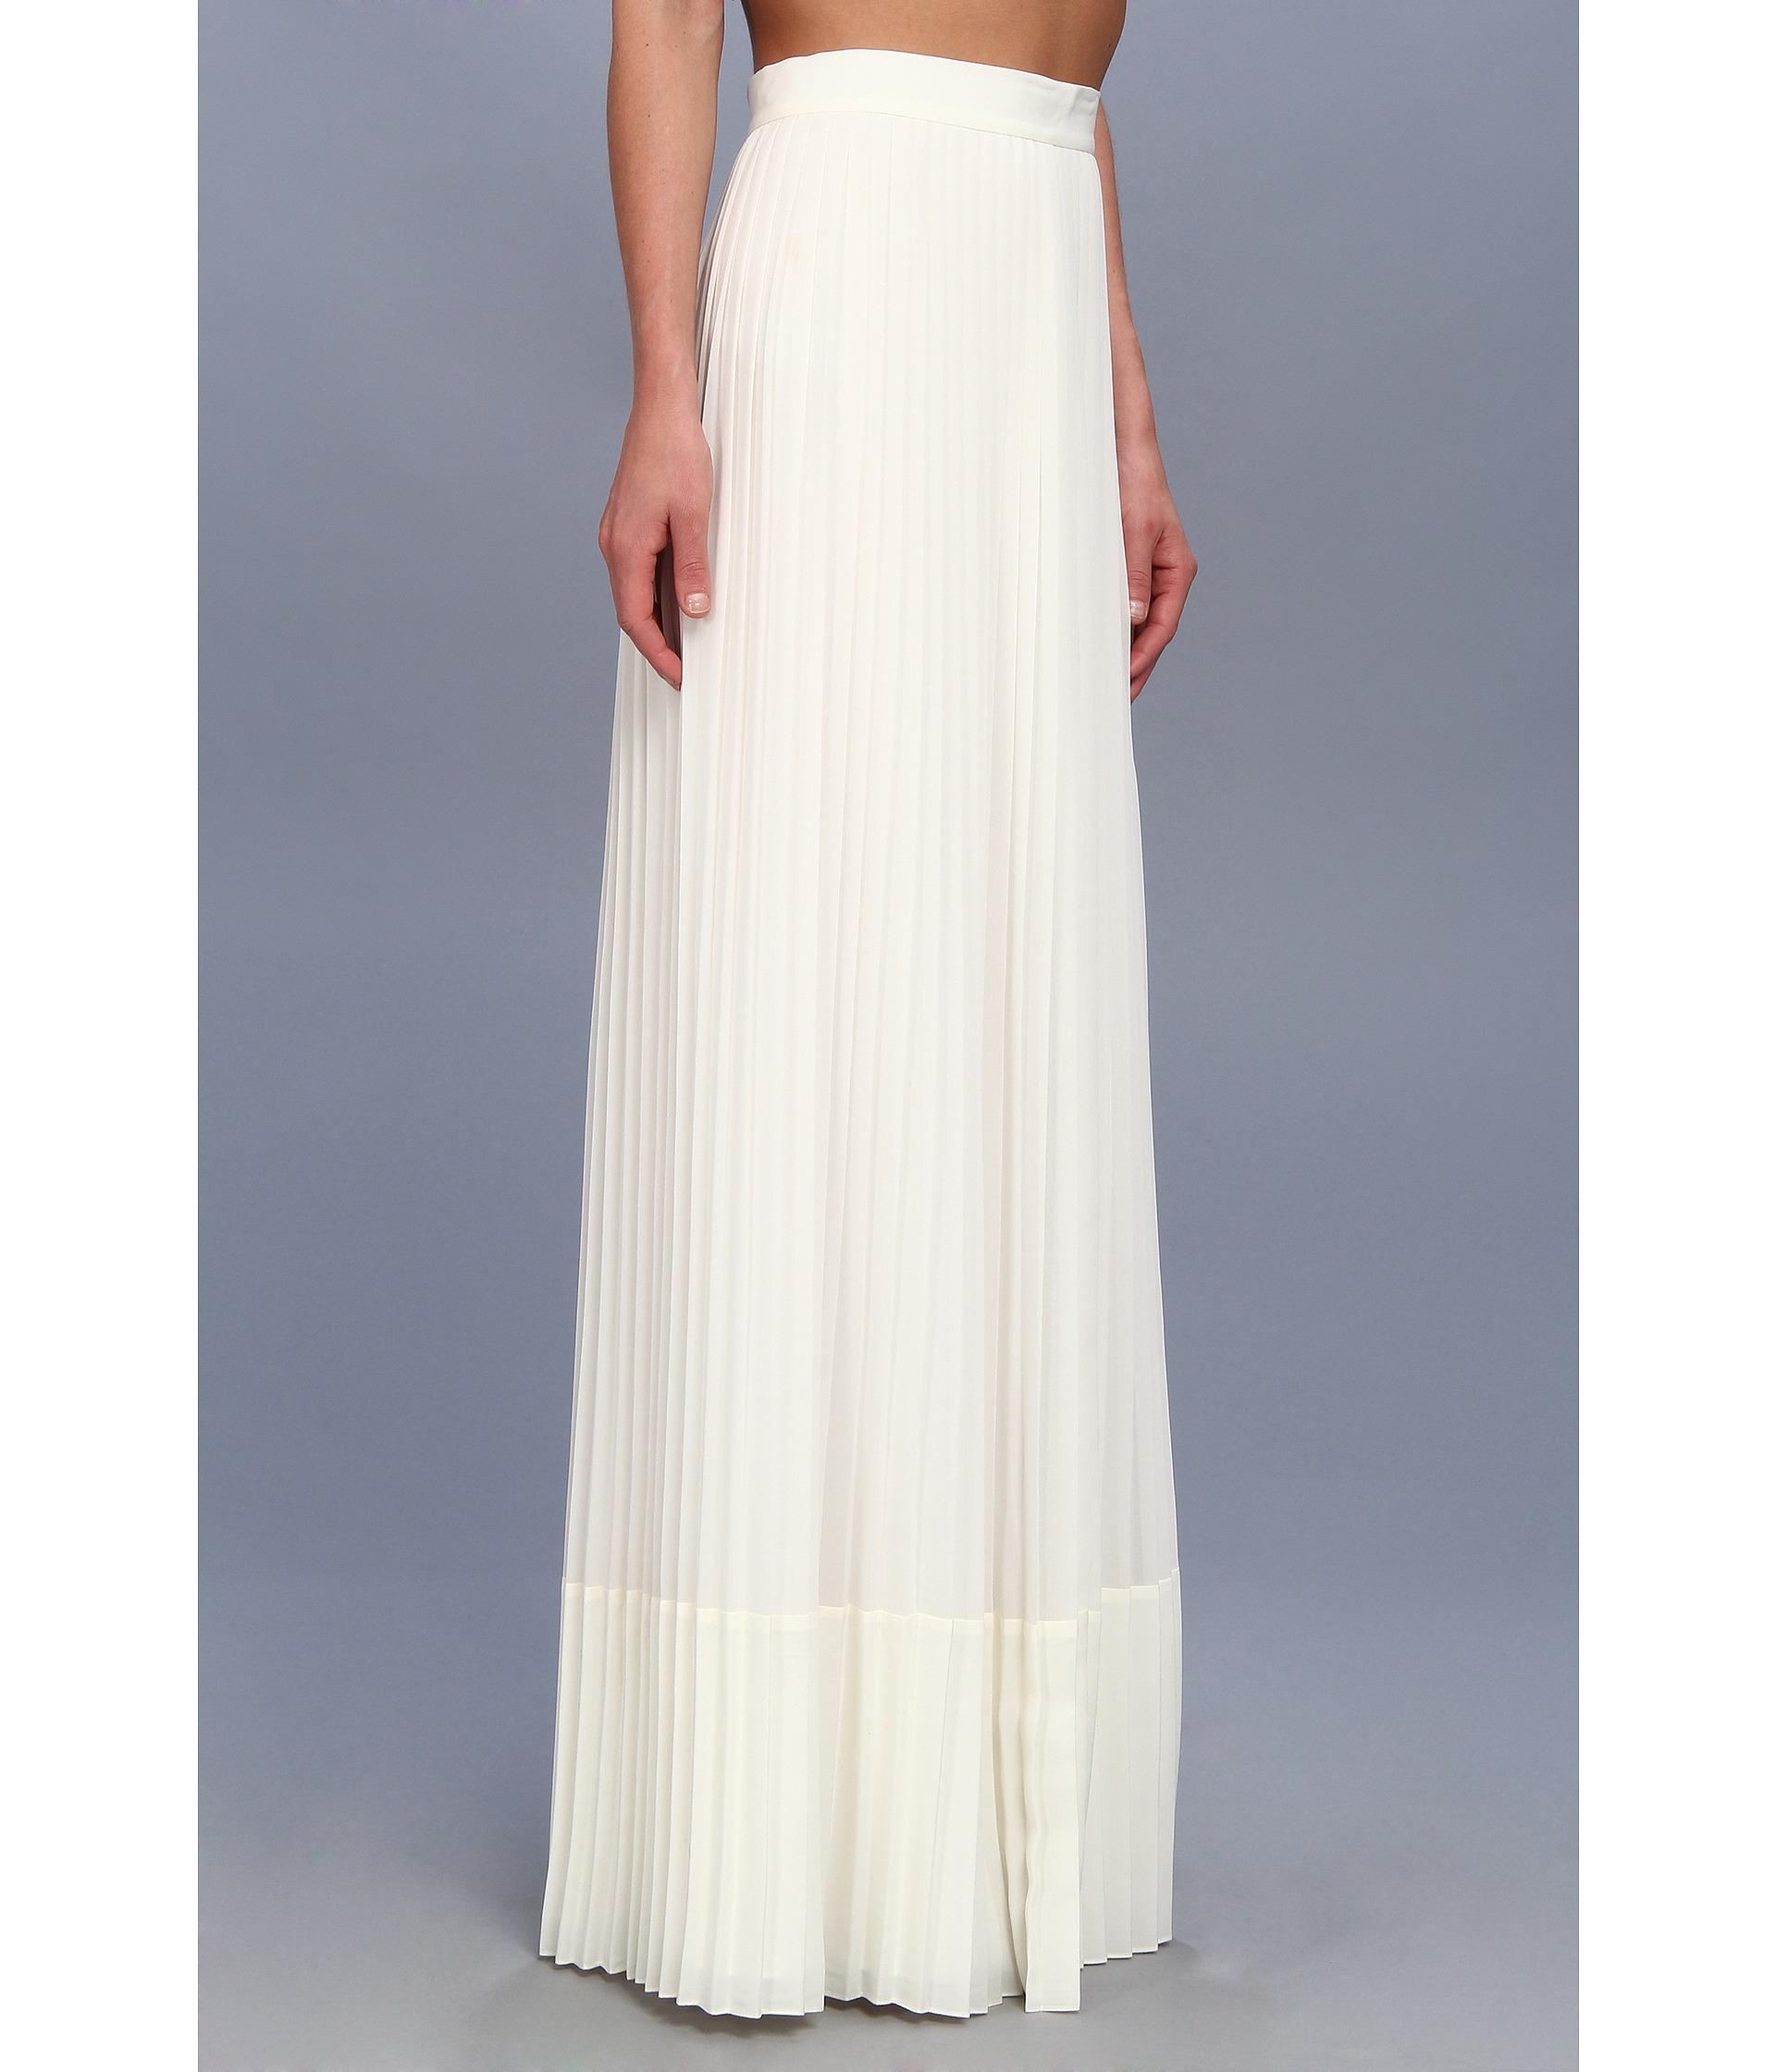 Badgley mischka Pleated Maxi Skirt in White | Lyst